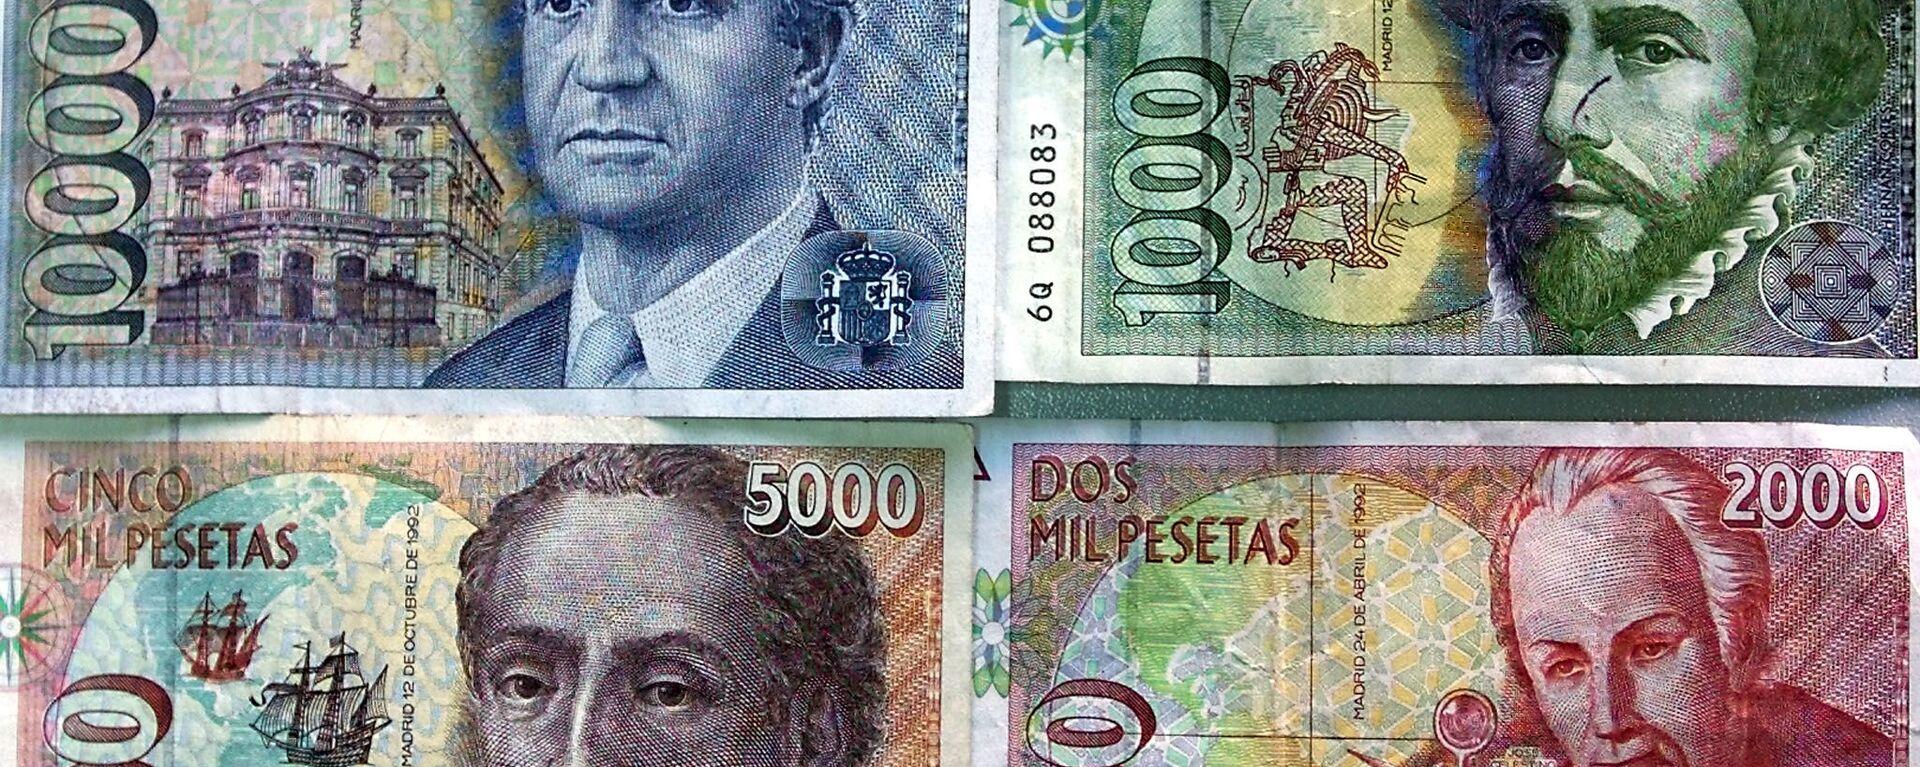 Billetes de pesetas - Sputnik Mundo, 1920, 19.10.2020